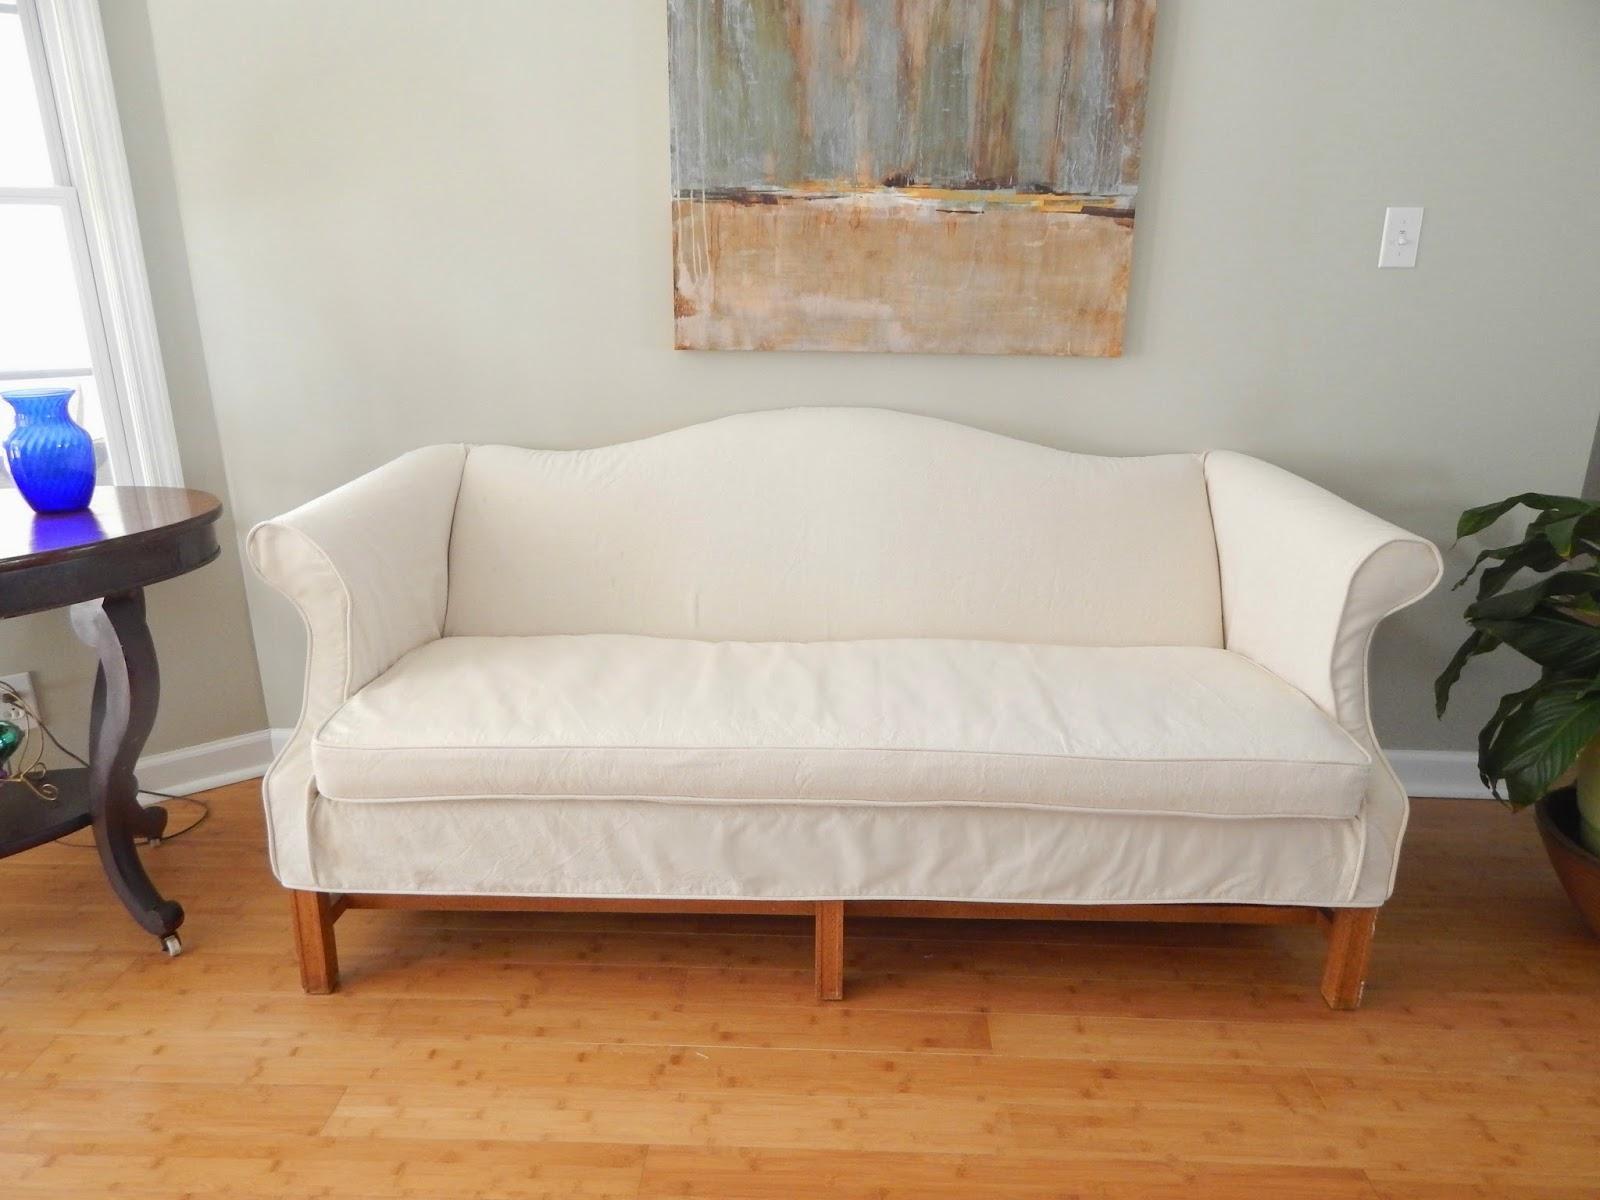 Pam Morris Sews: Slipcovers Regarding Canvas Sofa Slipcovers (Image 15 of 20)